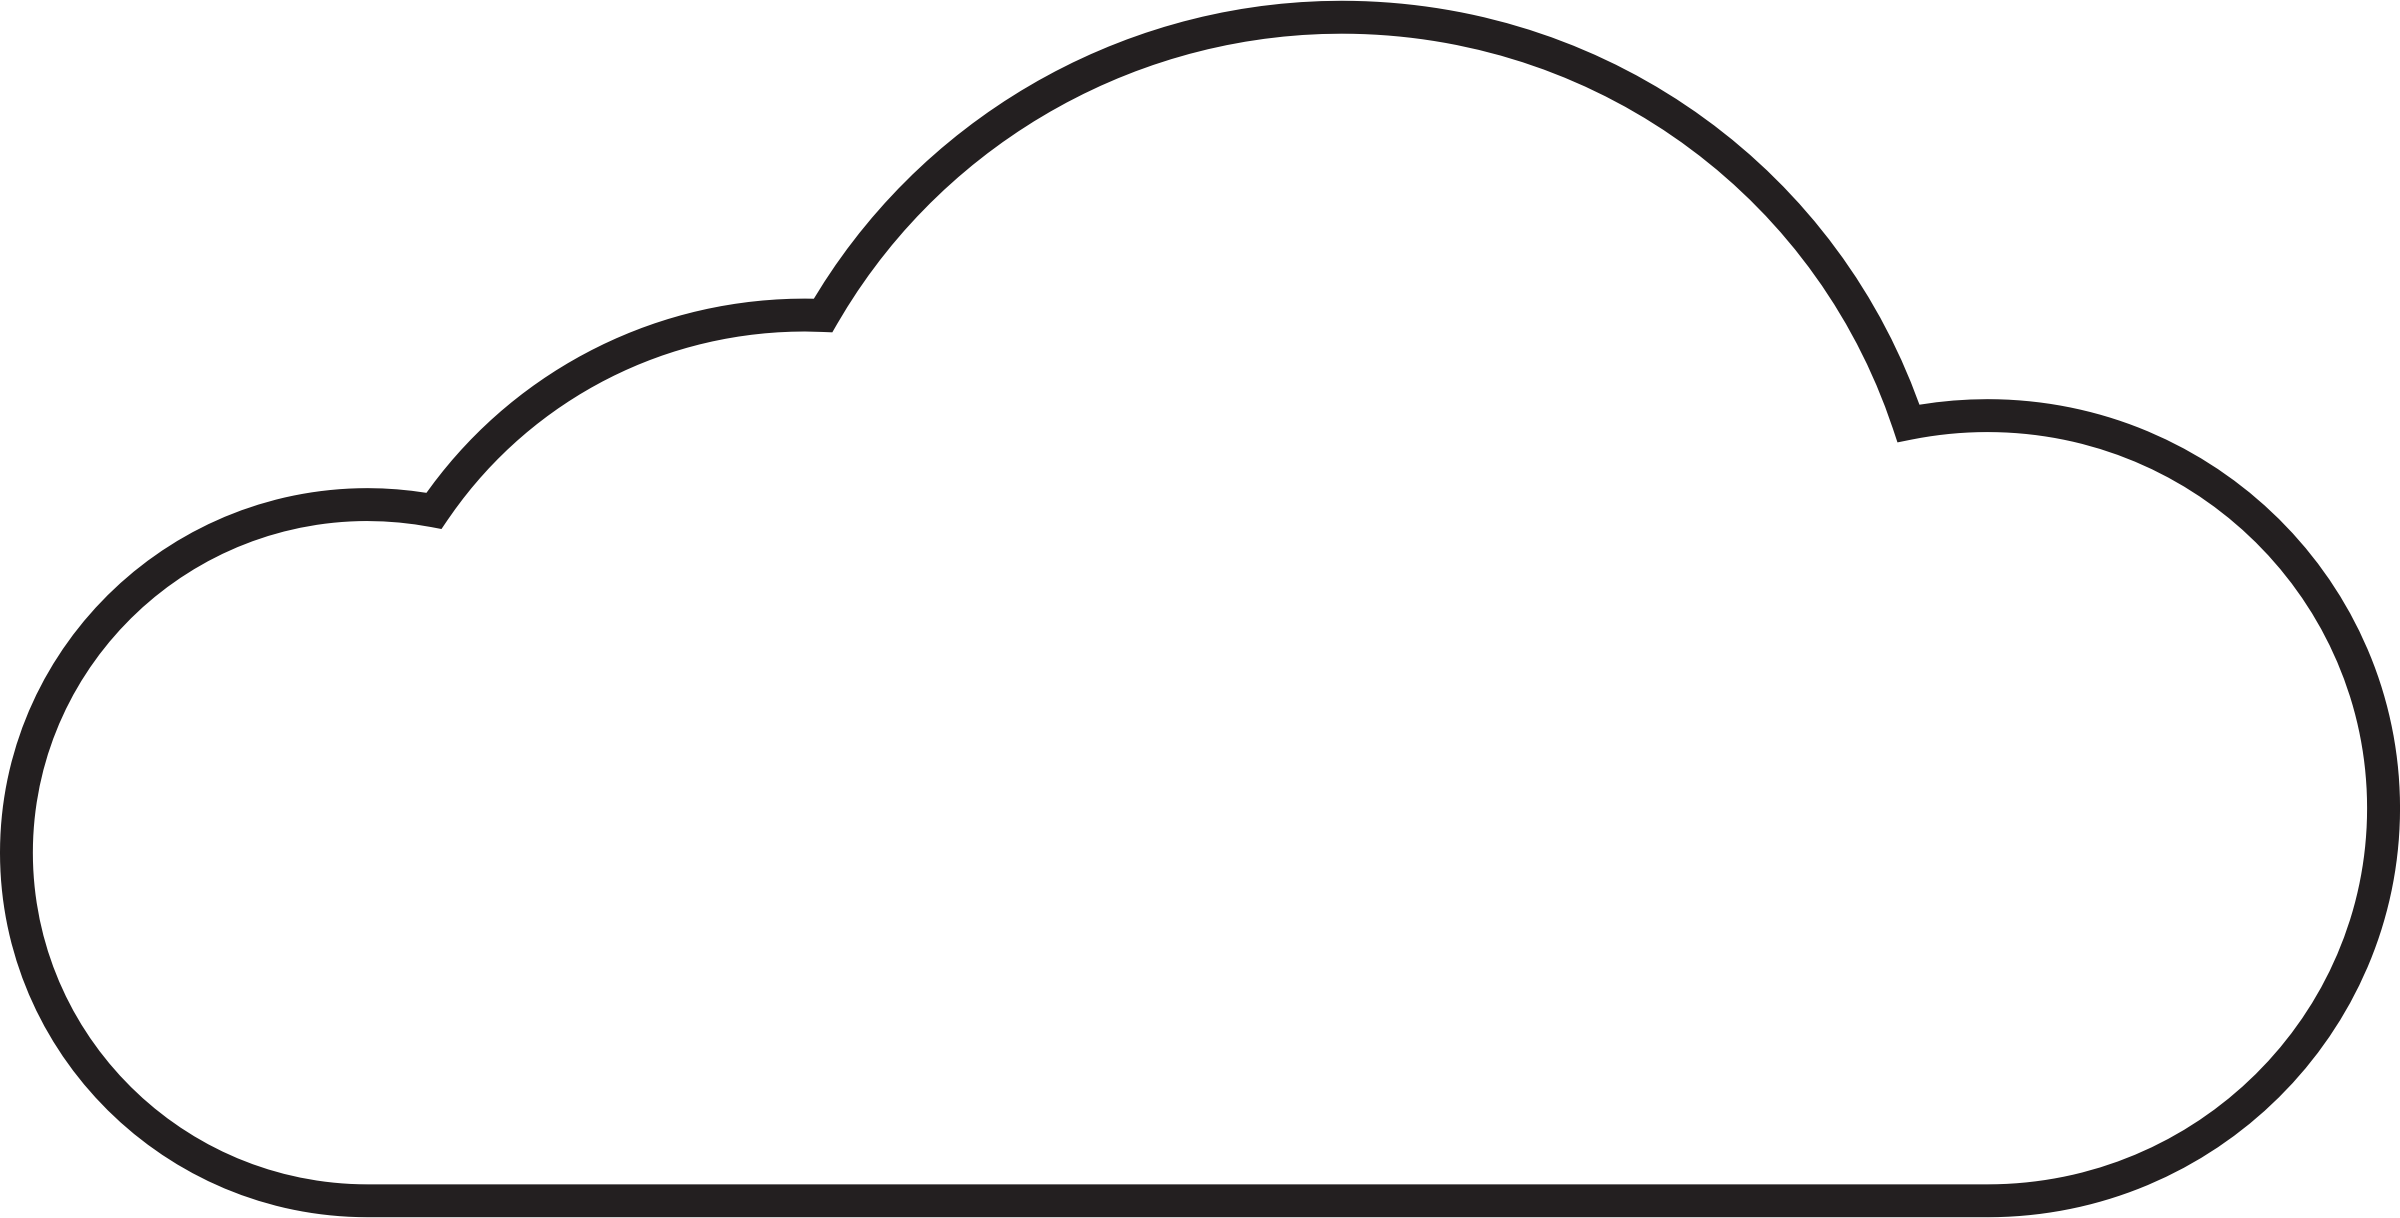 Cloud Vector Outline at GetDrawings.com.